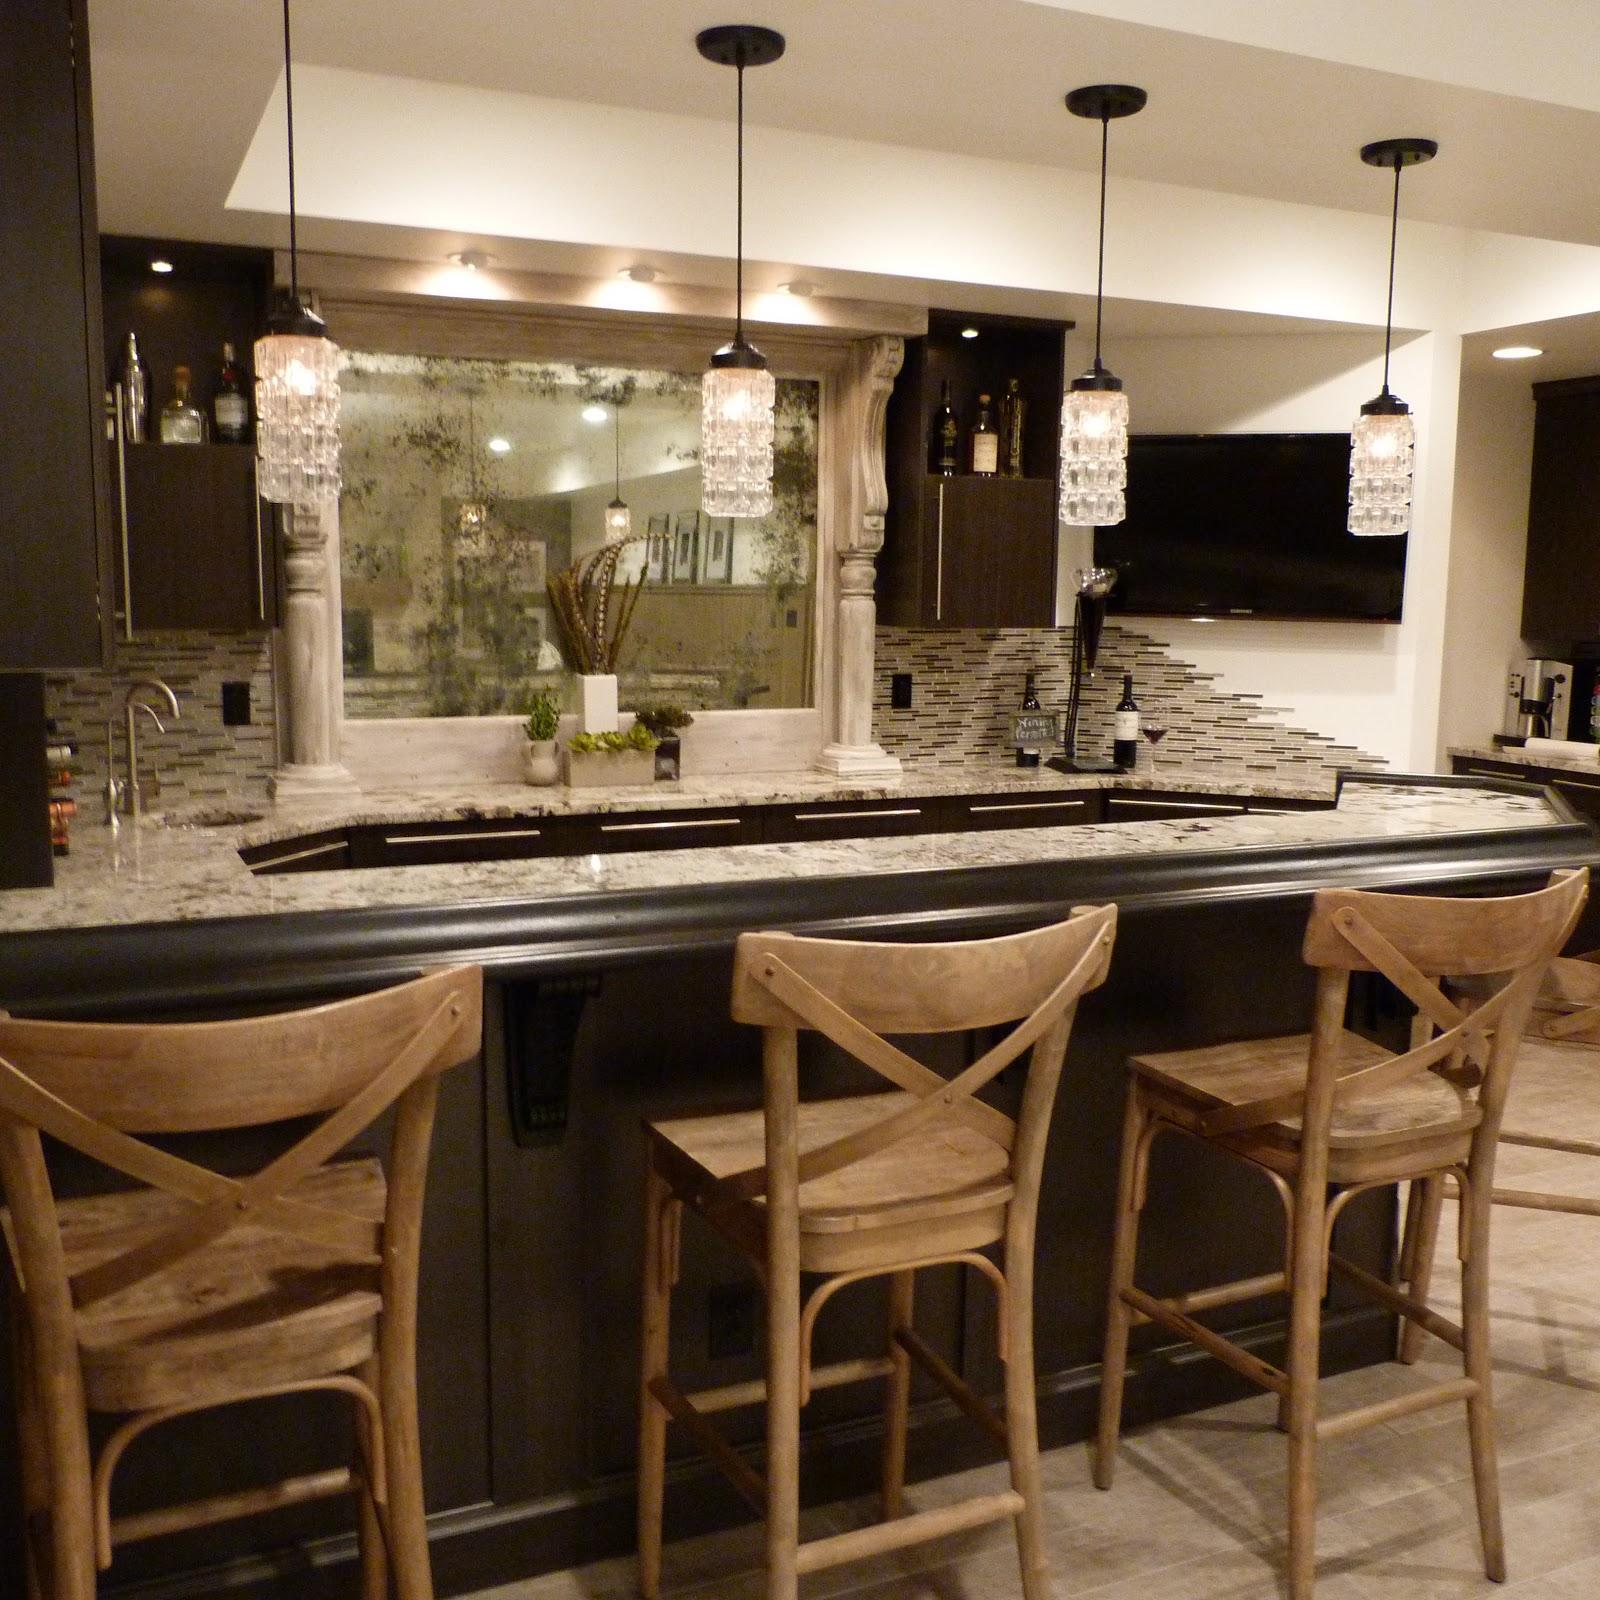 17 Rustic Home Bar Designs Ideas: House Envy: Our Rustic Modern Bar Reveal